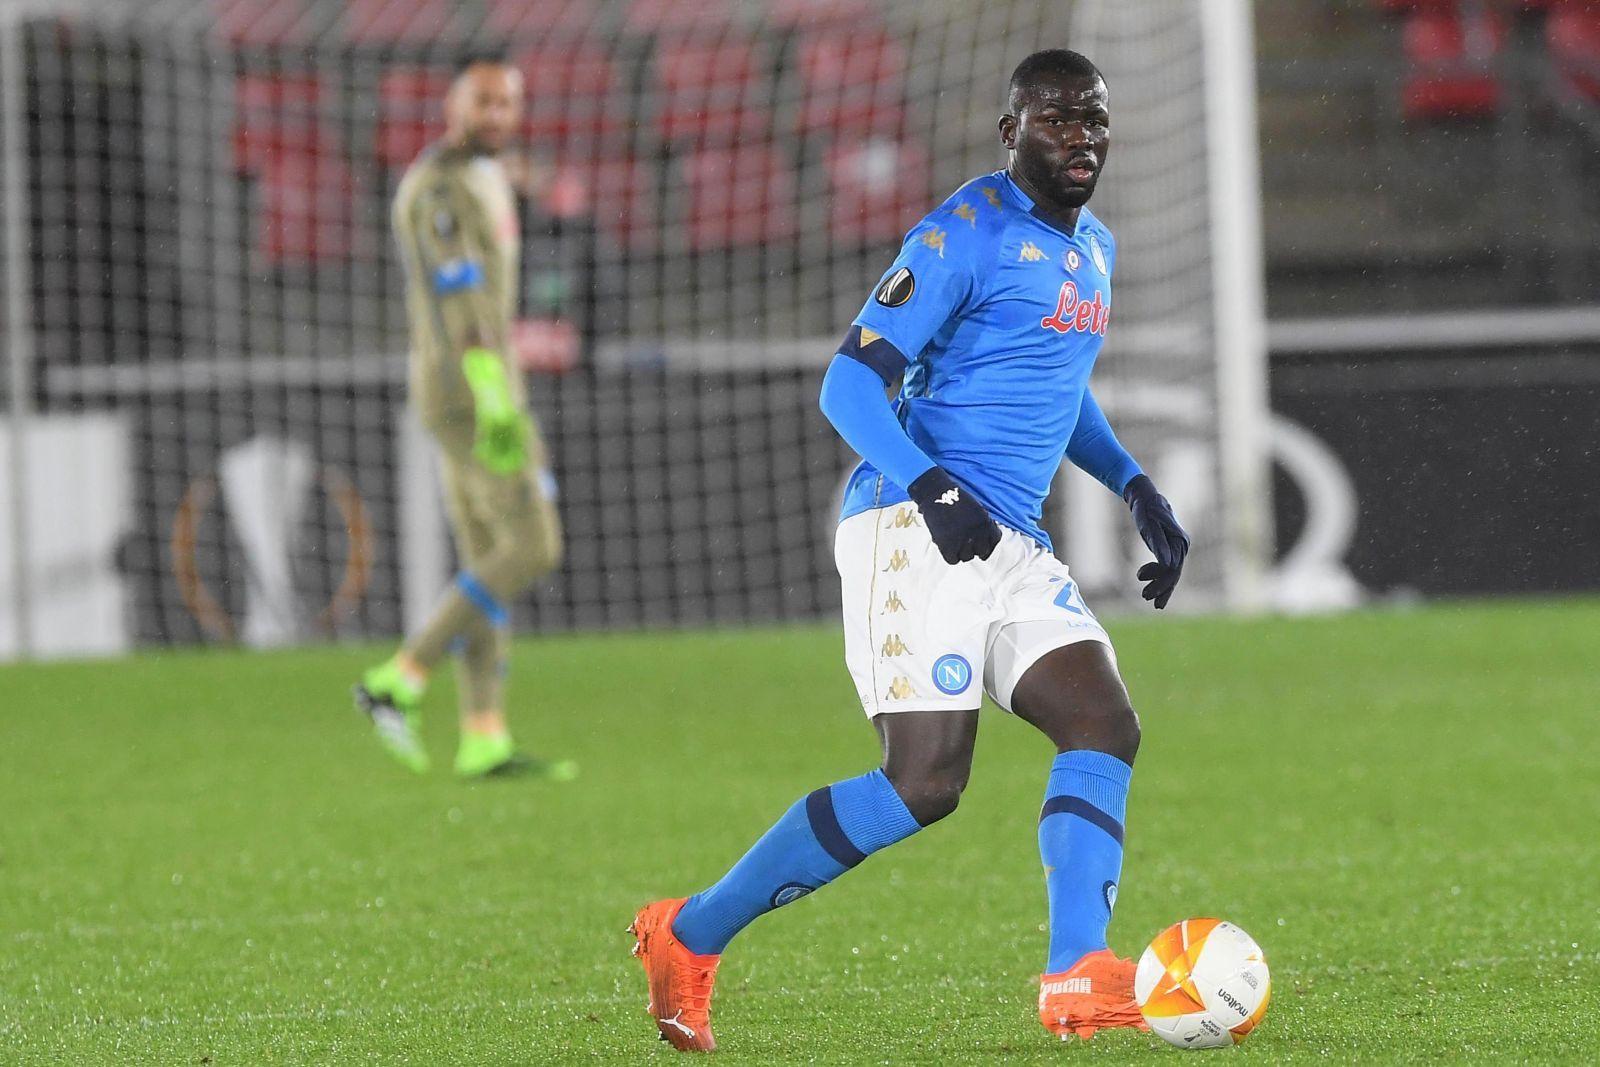 Epingle Par Mongbon Sur Football Liverpool Psg Senegal